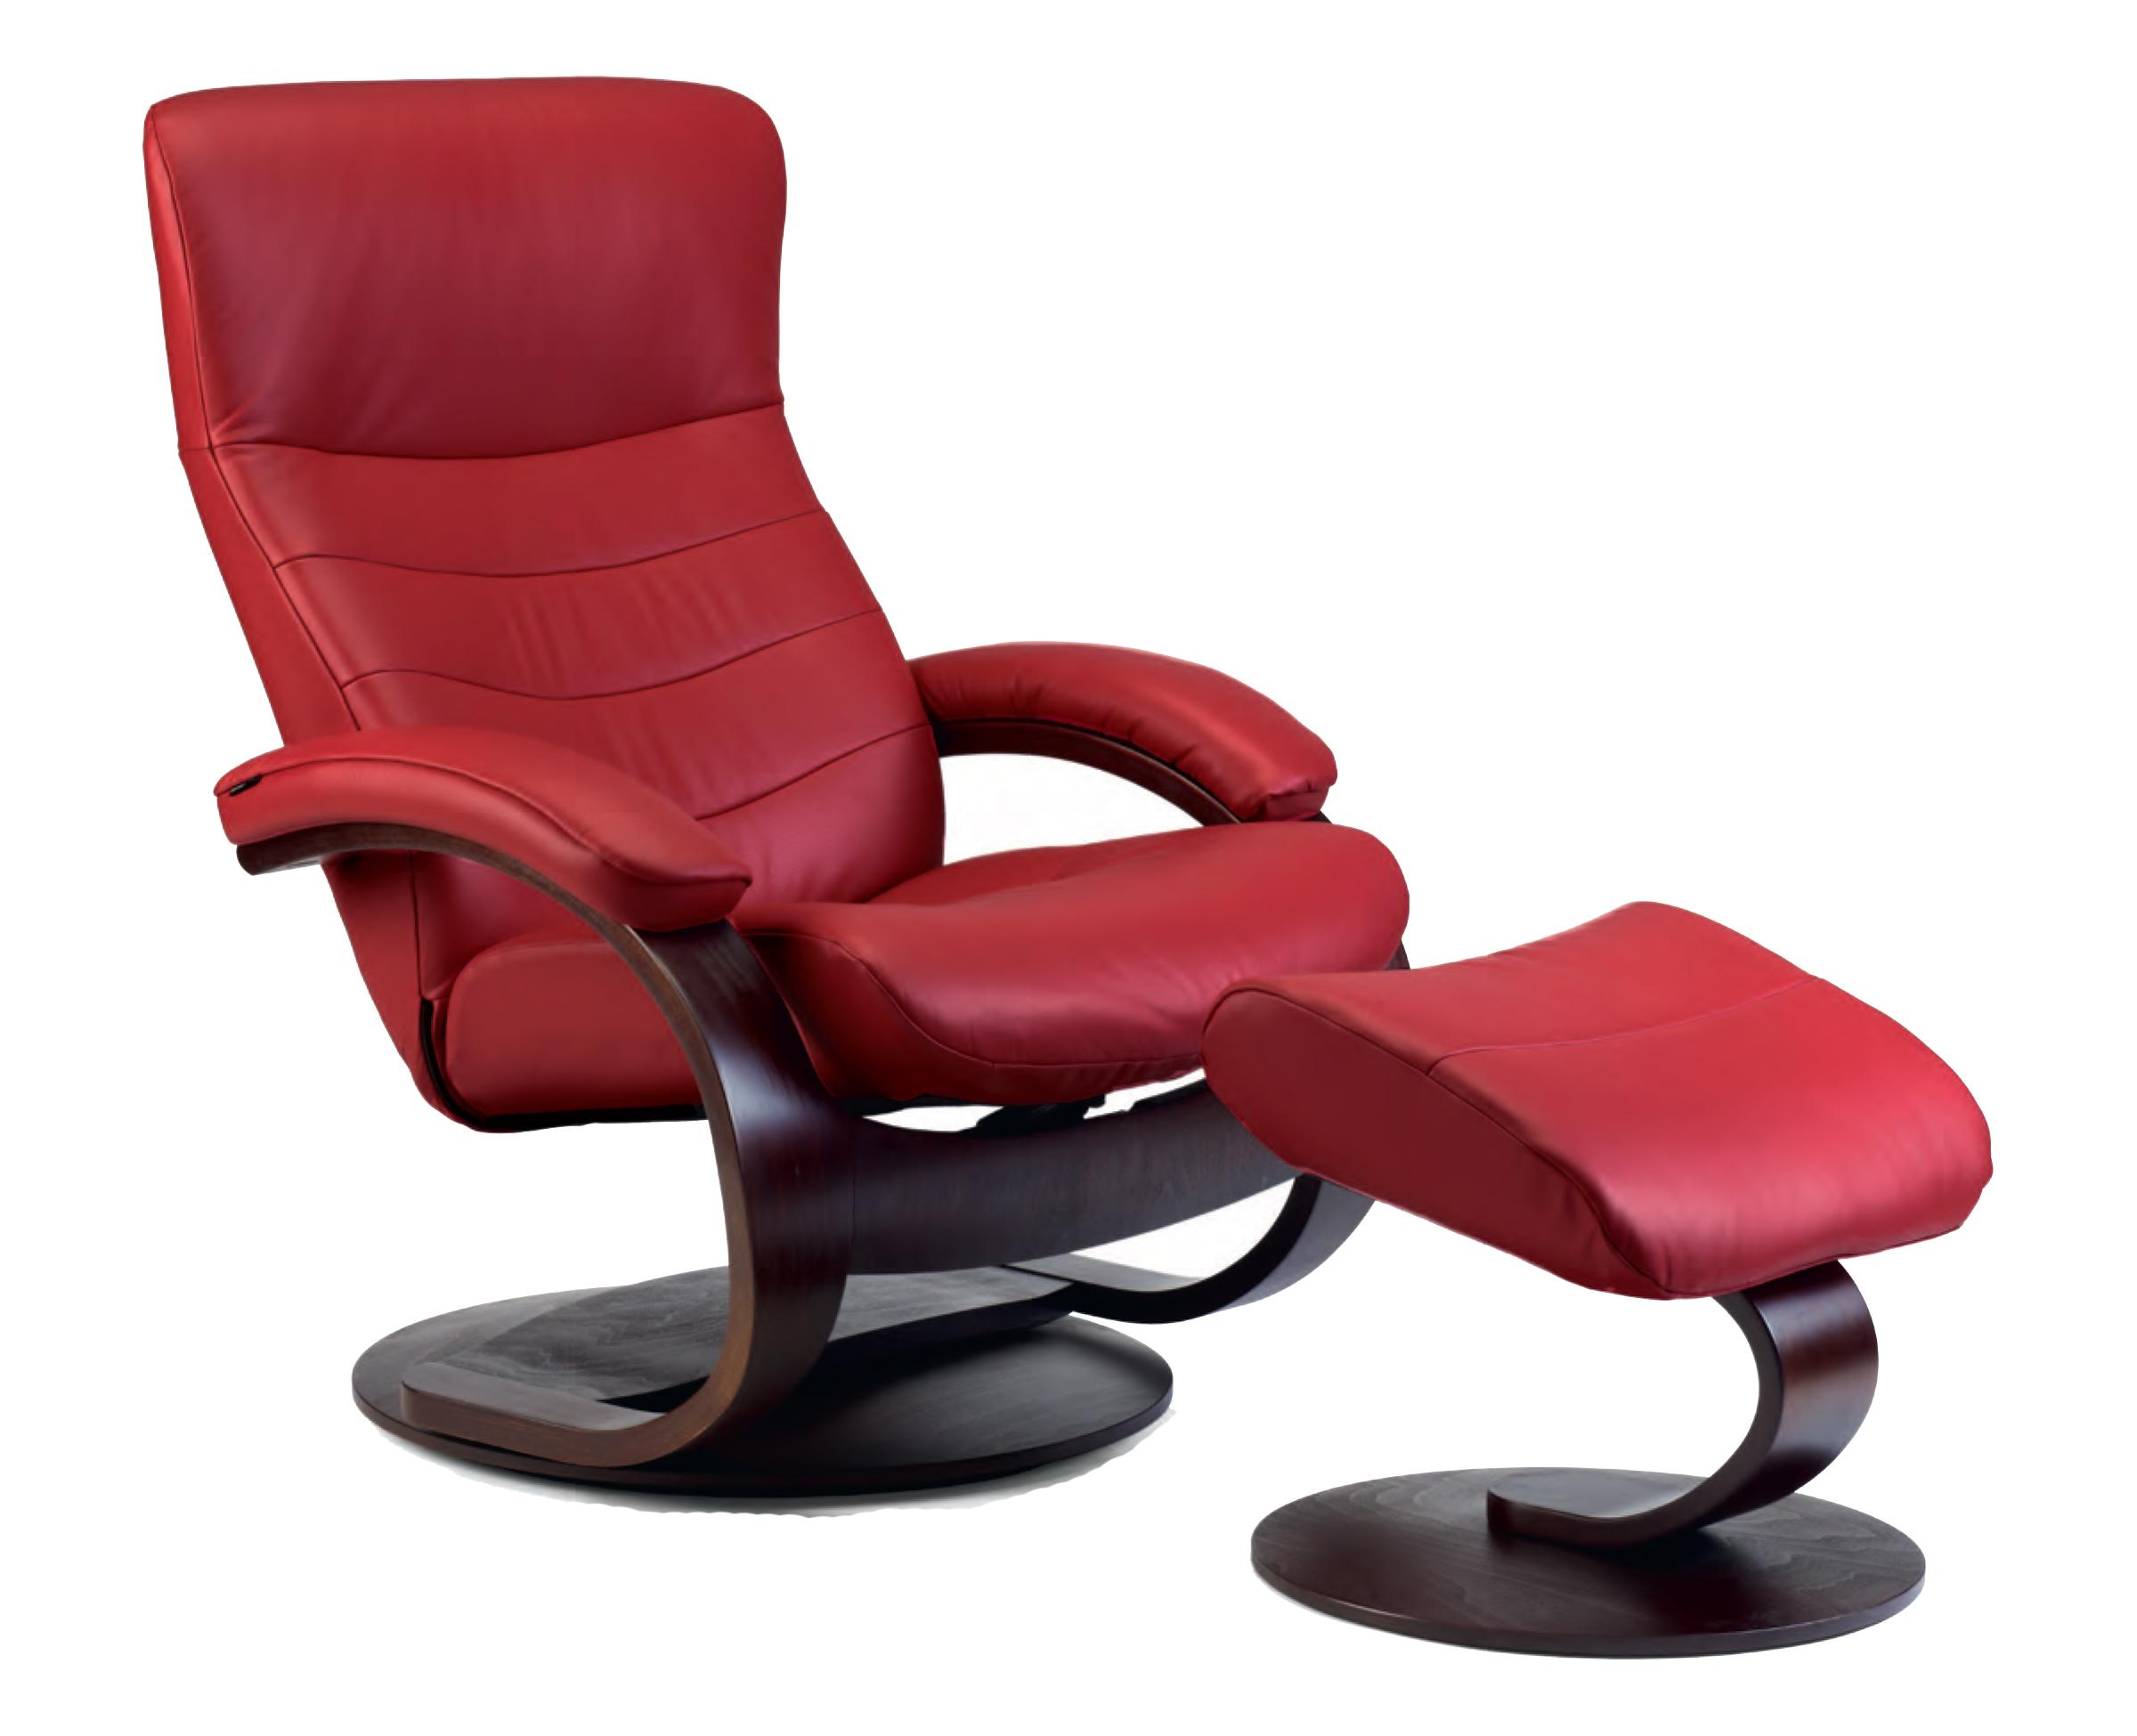 ergonomic recliner chair brown bean bag fjords trandal leather c frame ottoman and scandinavian lounger